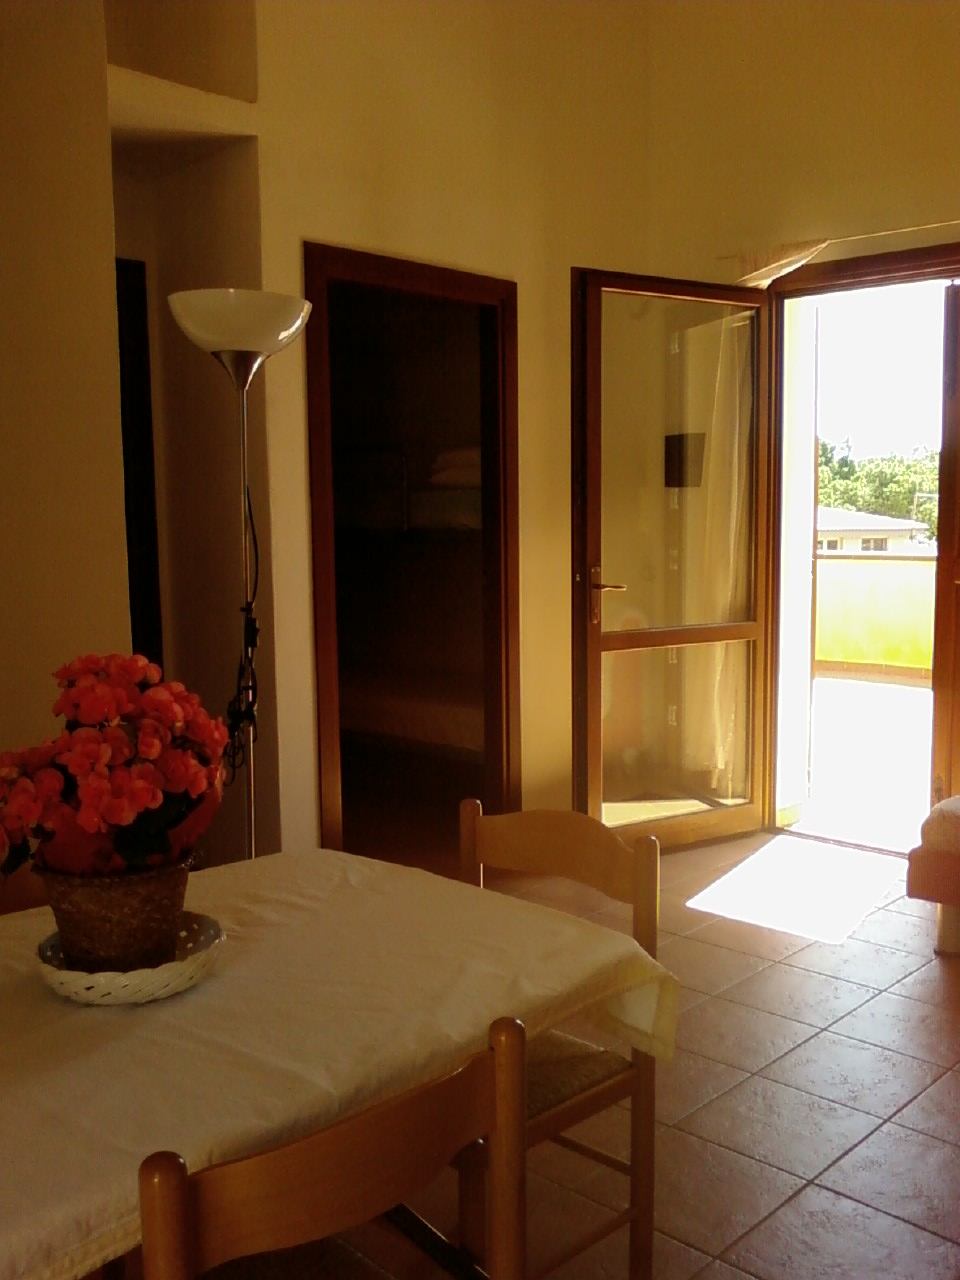 affitto appartamento mare castiadas 6766 (20130424080445-2013-66097-NDP.jpg)